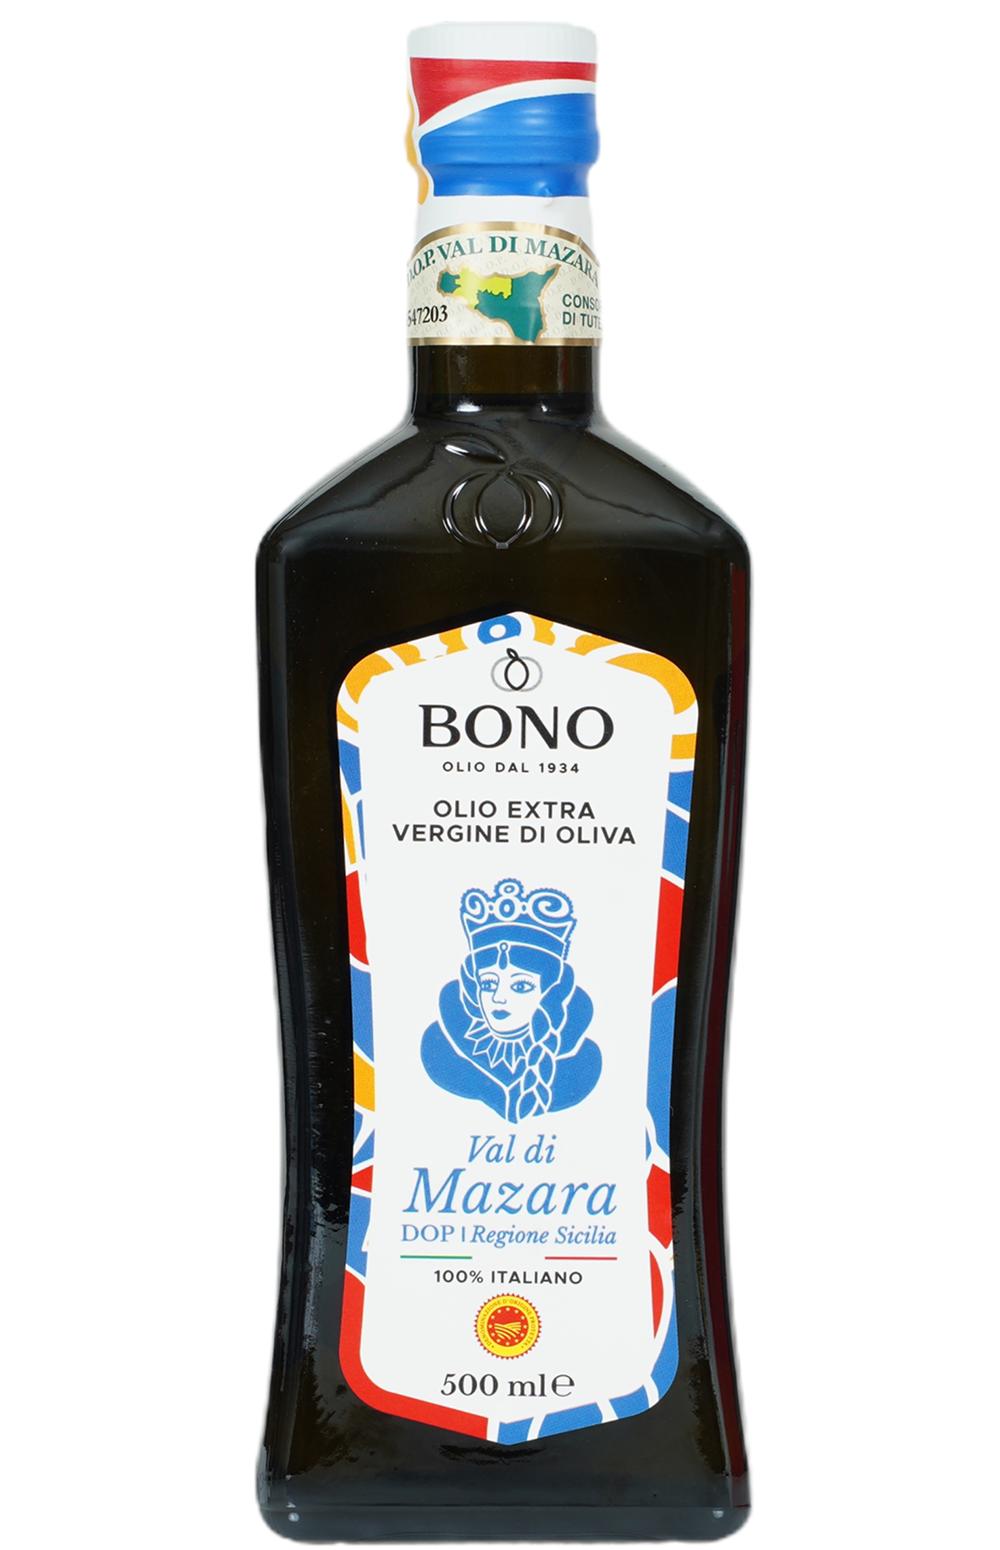 Bono Val di Mazara DOP